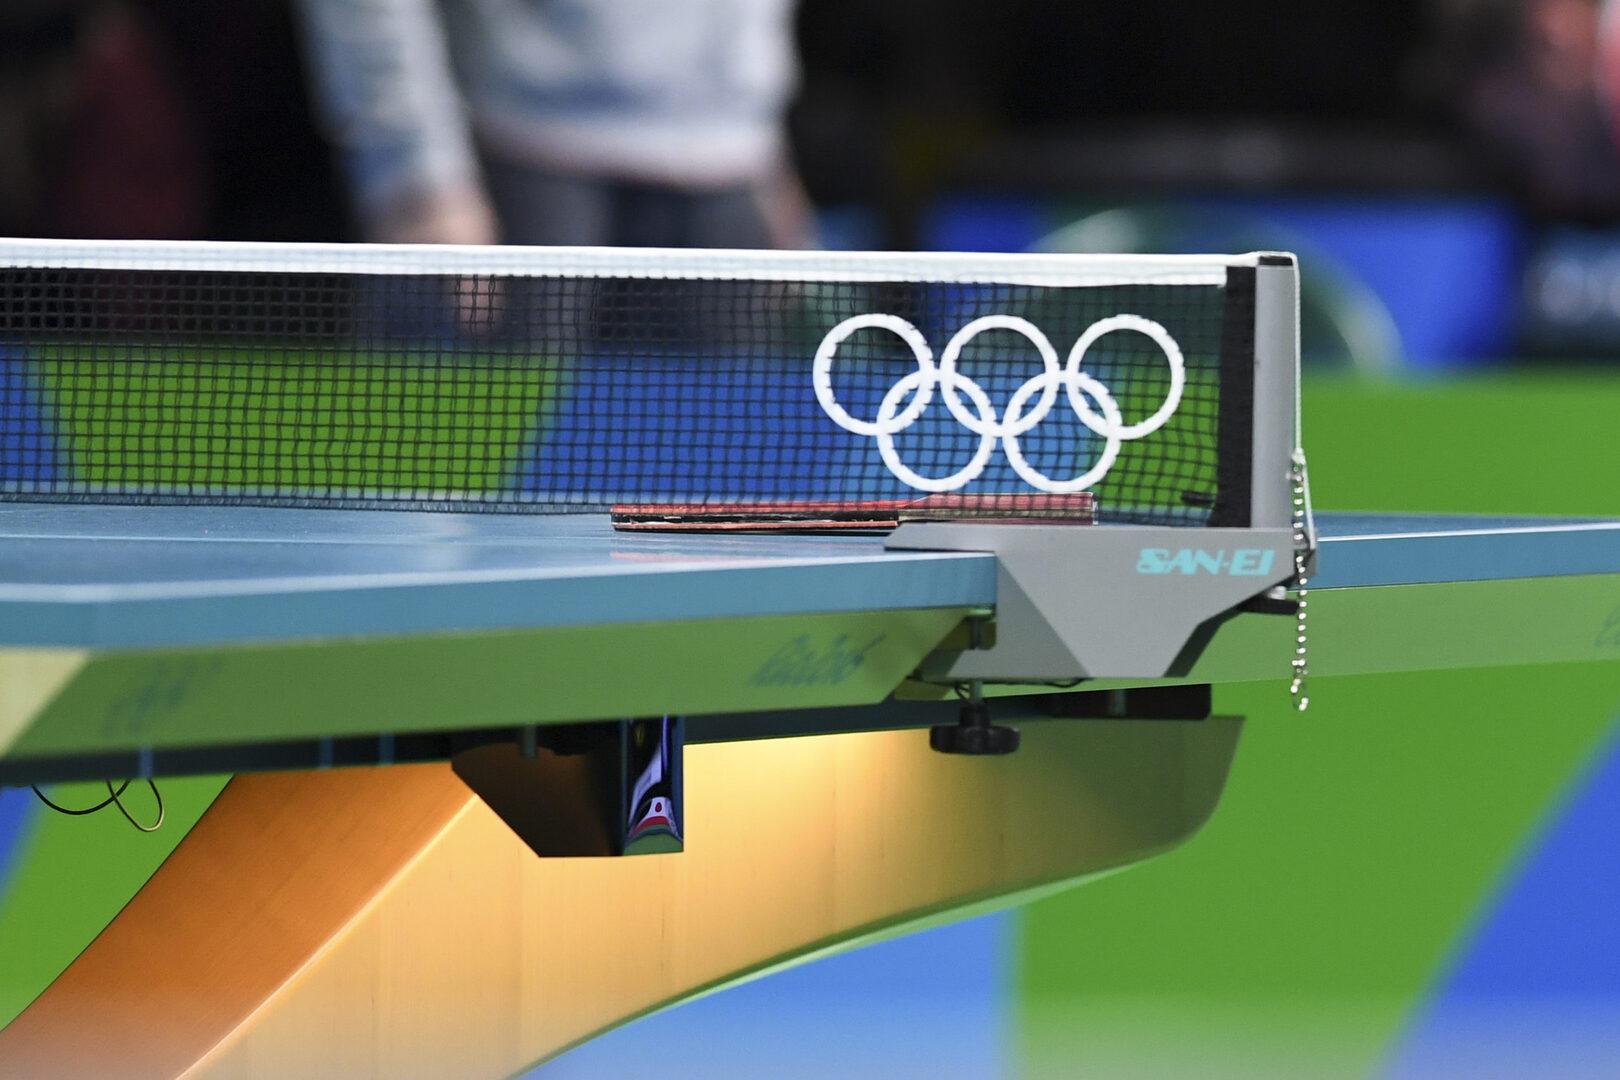 Paralympian Ibrahim Hamadtou Plays Table Tennis With No Arms & It Is Awe-Inspiring (VIDEO)